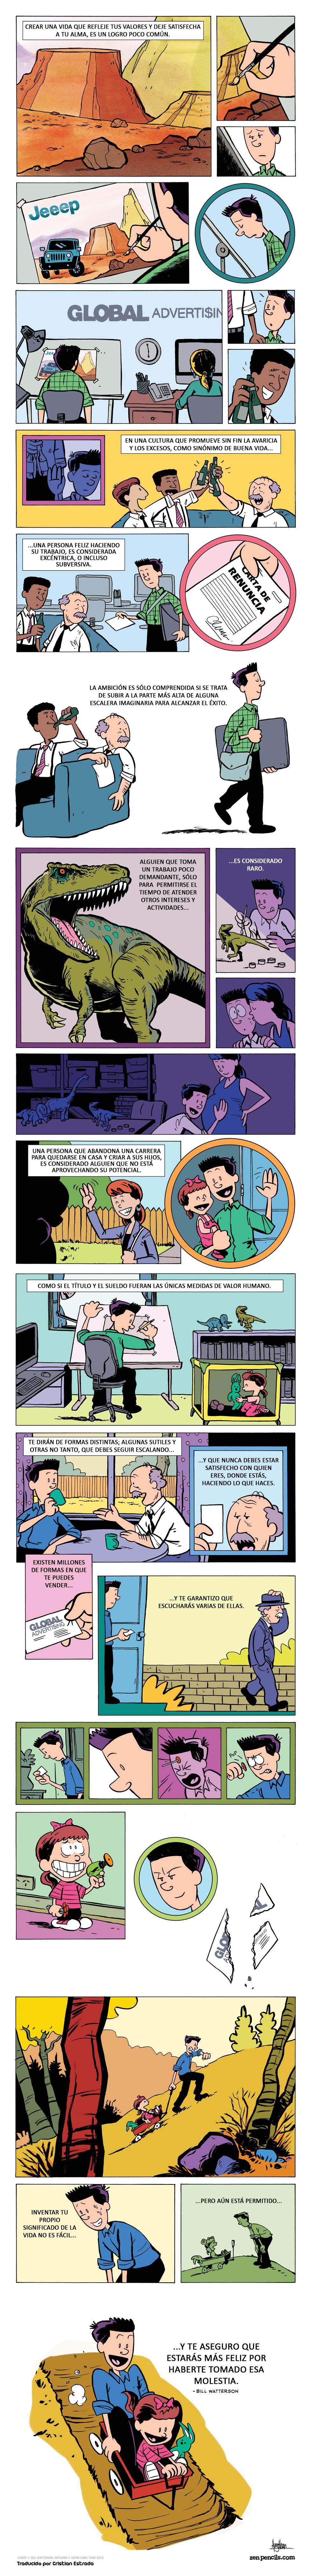 Consejo de un dibujante